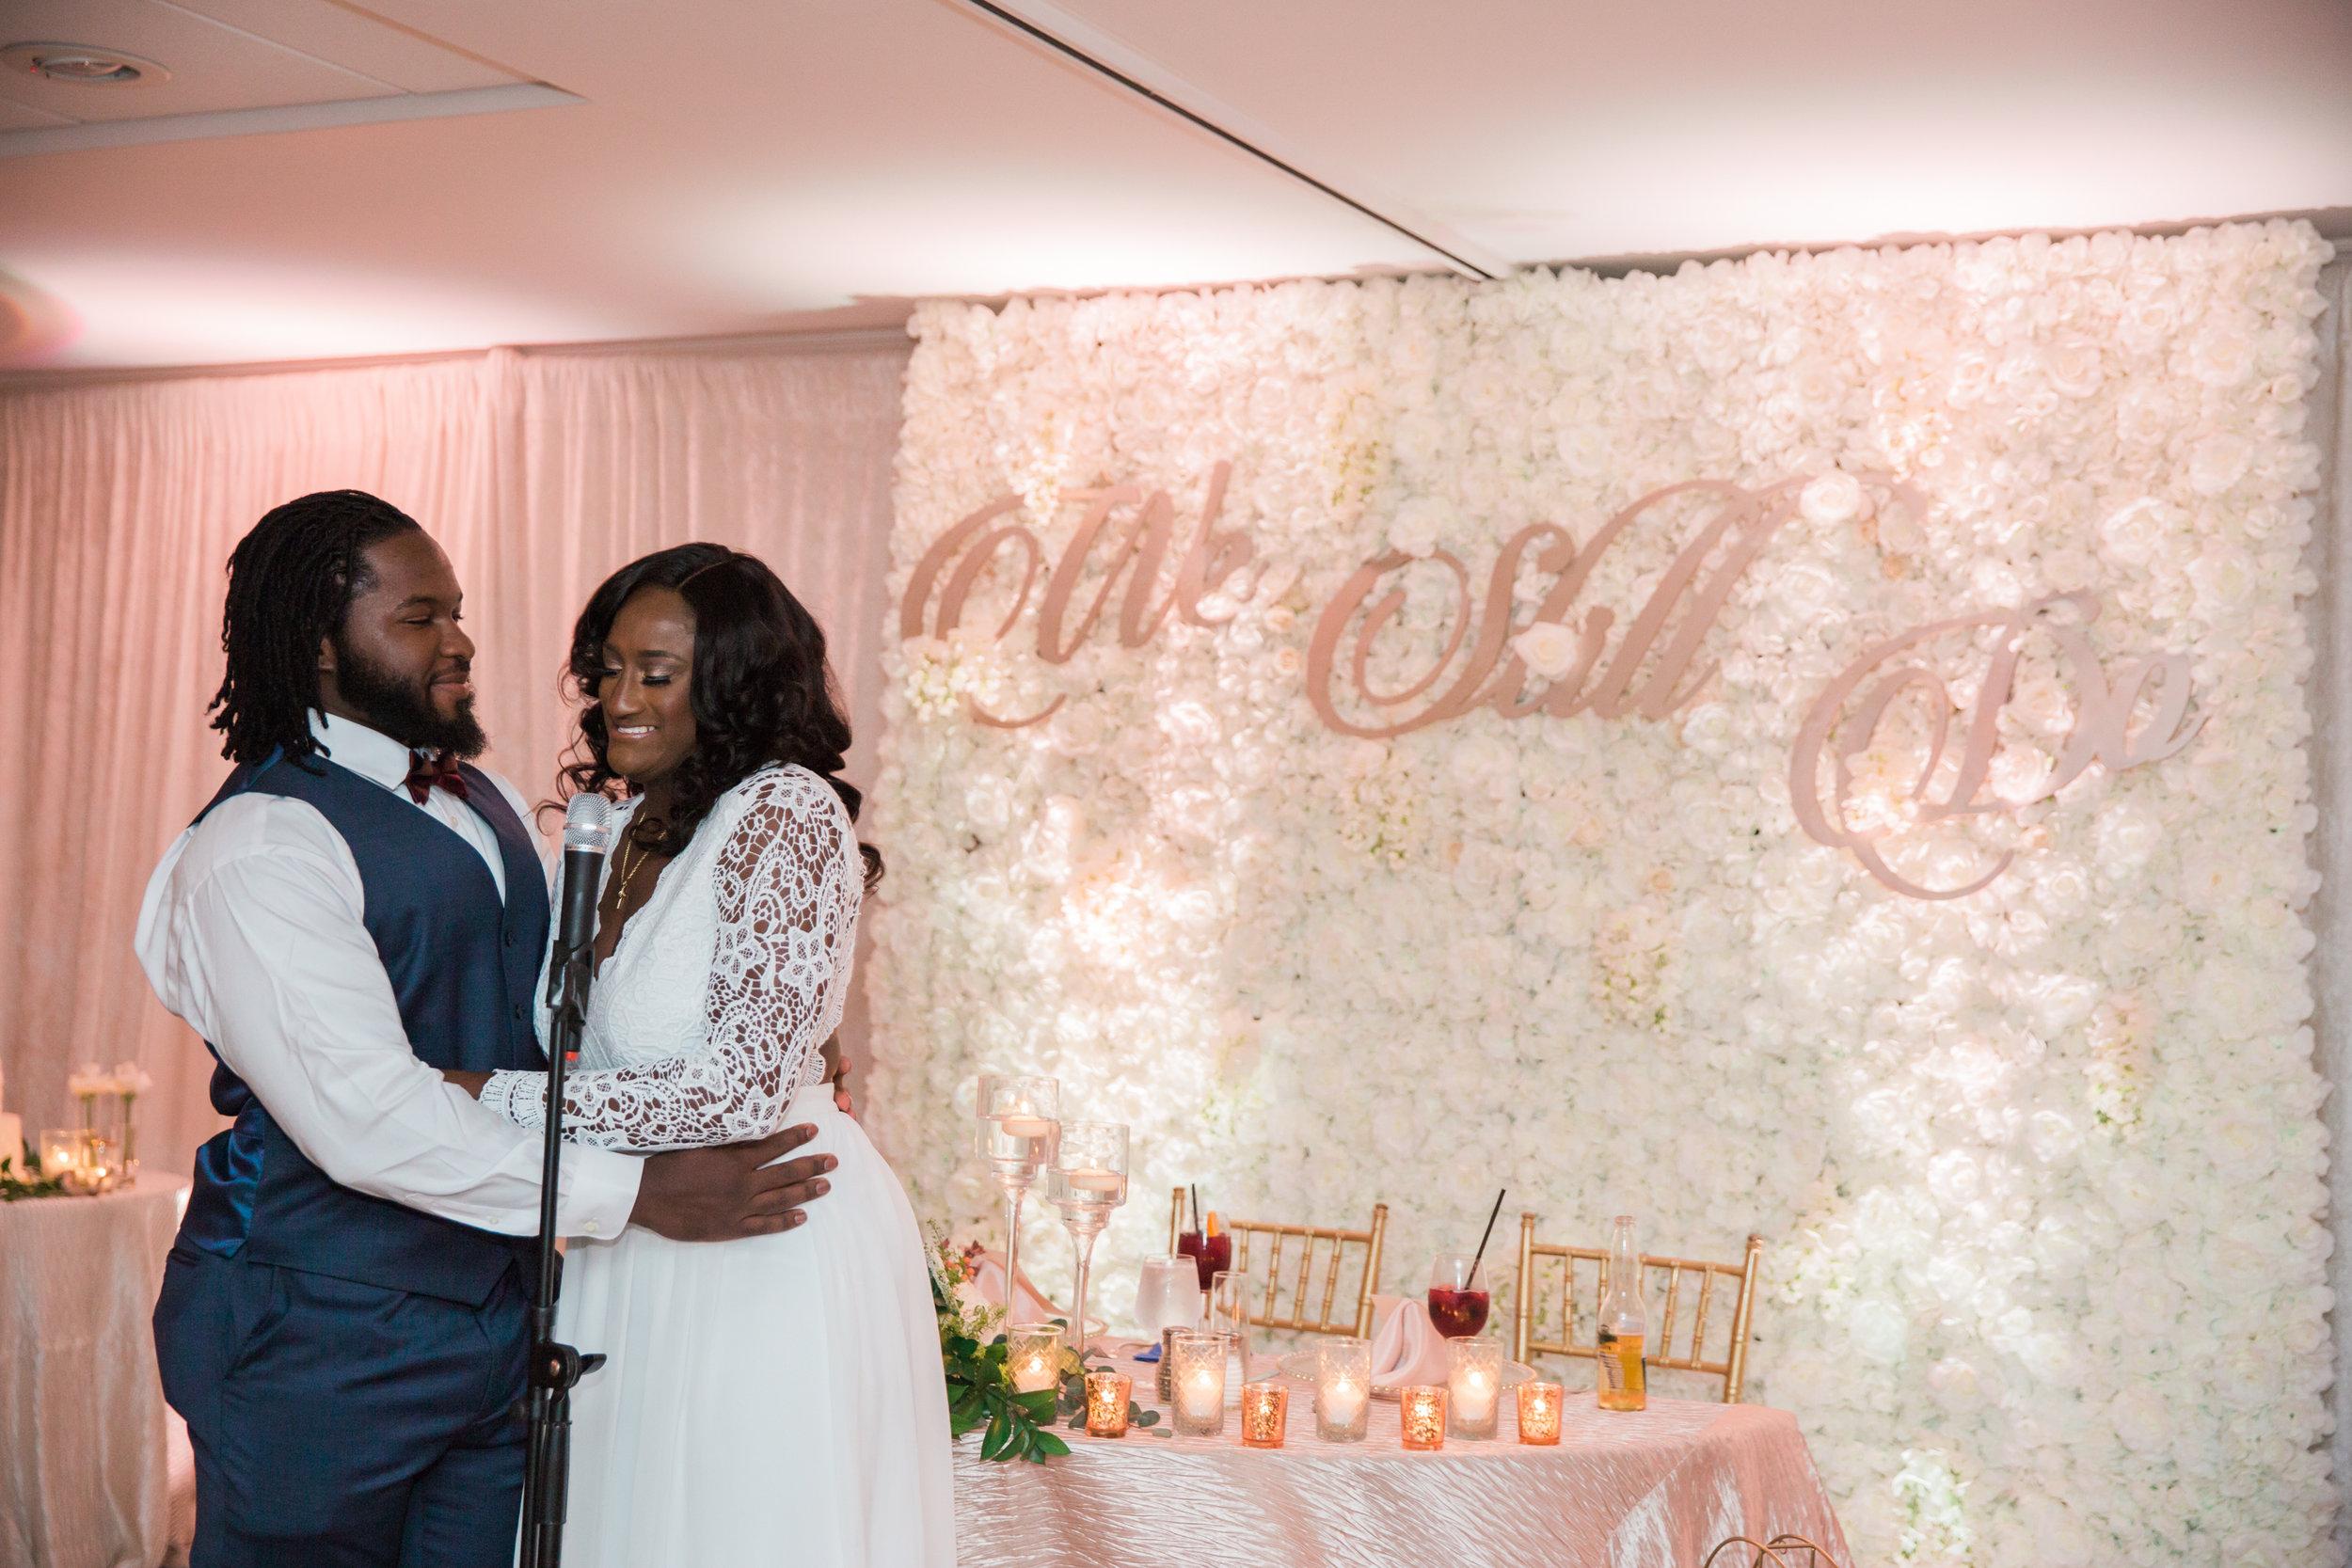 Baltimore City Wedding at Hotel Indigo Megapixels Media Photography Tira Lynn Events Black Bride and Groom (52 of 74).jpg